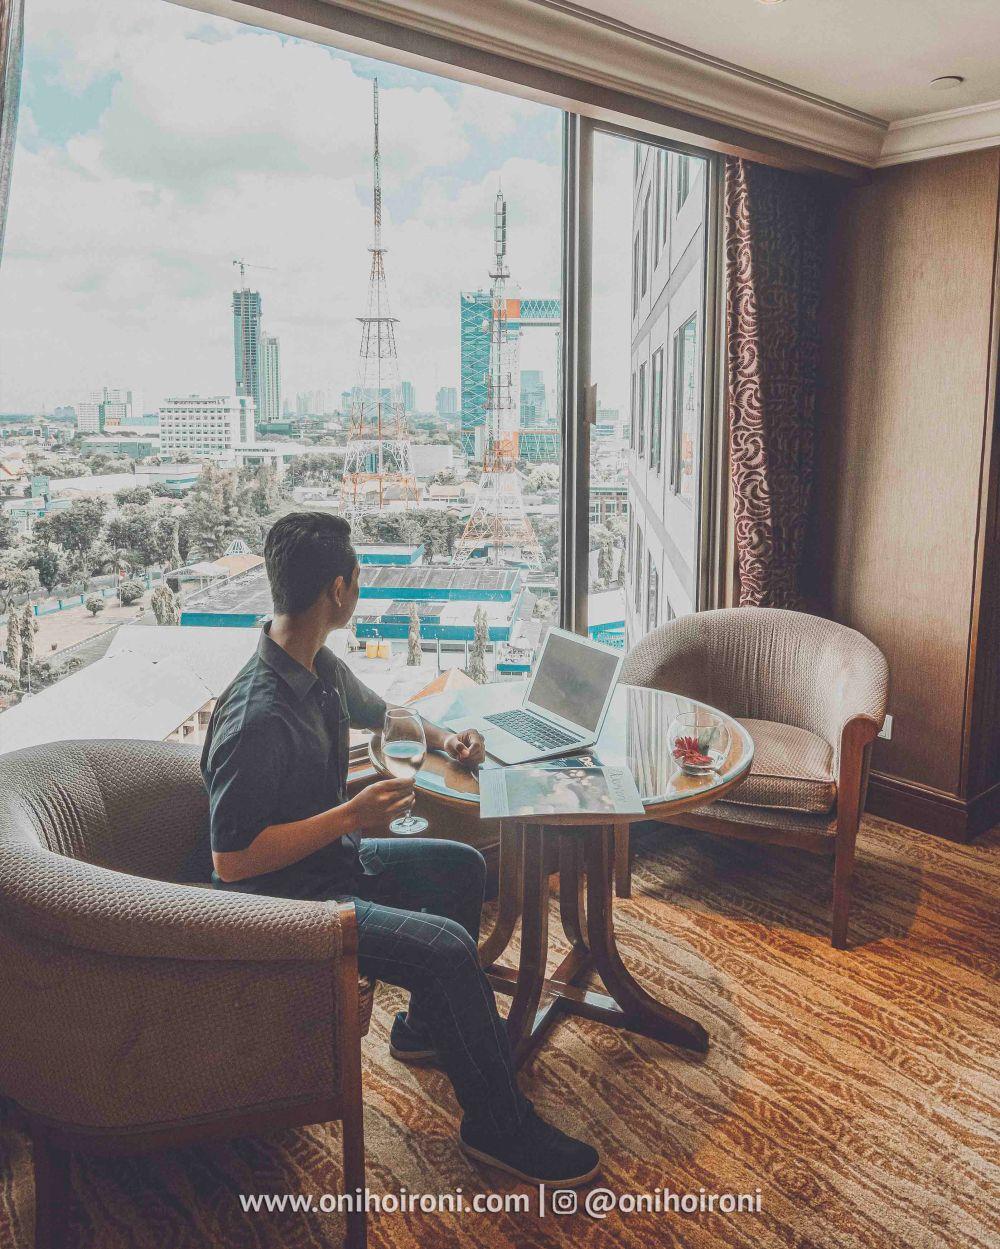 3 Review Horizon Club Lounge Shangrila Surabaya Hotel Oni hoironi